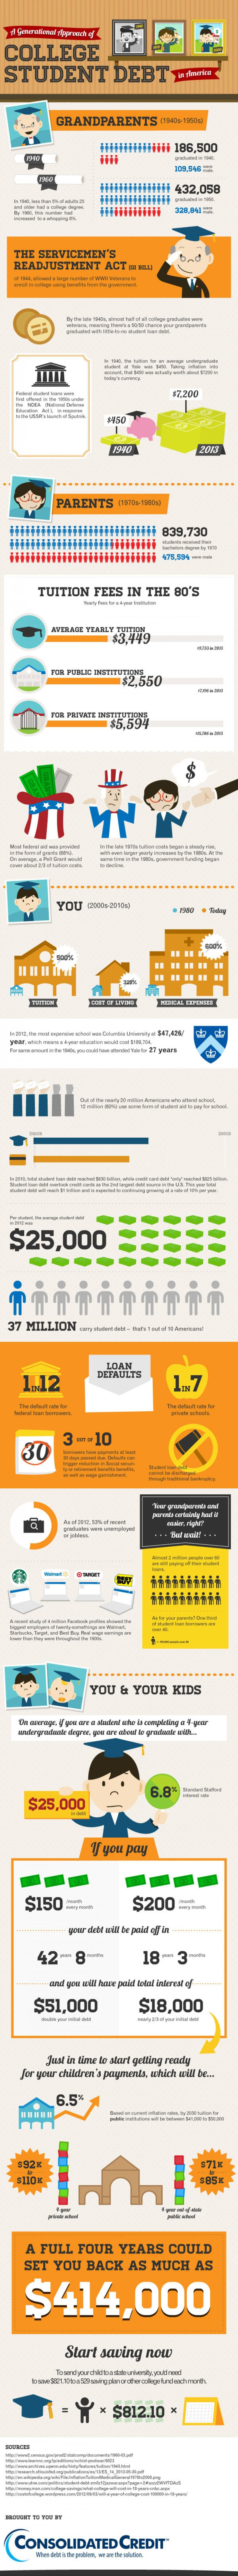 12. College Student Debt